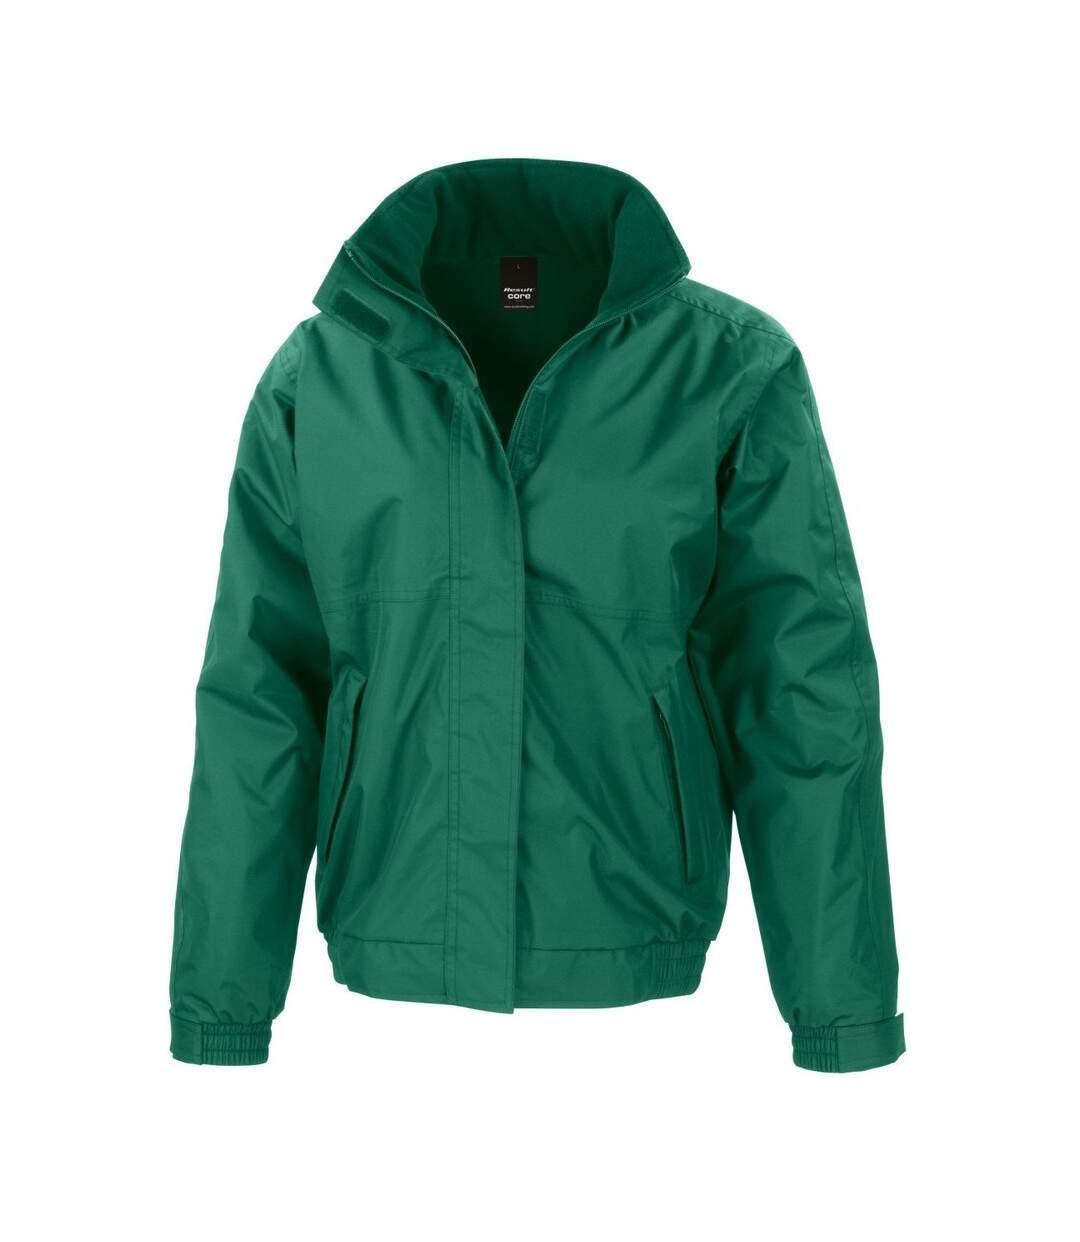 Result Core Mens Channel Jacket (Bottle Green) - UTBC914